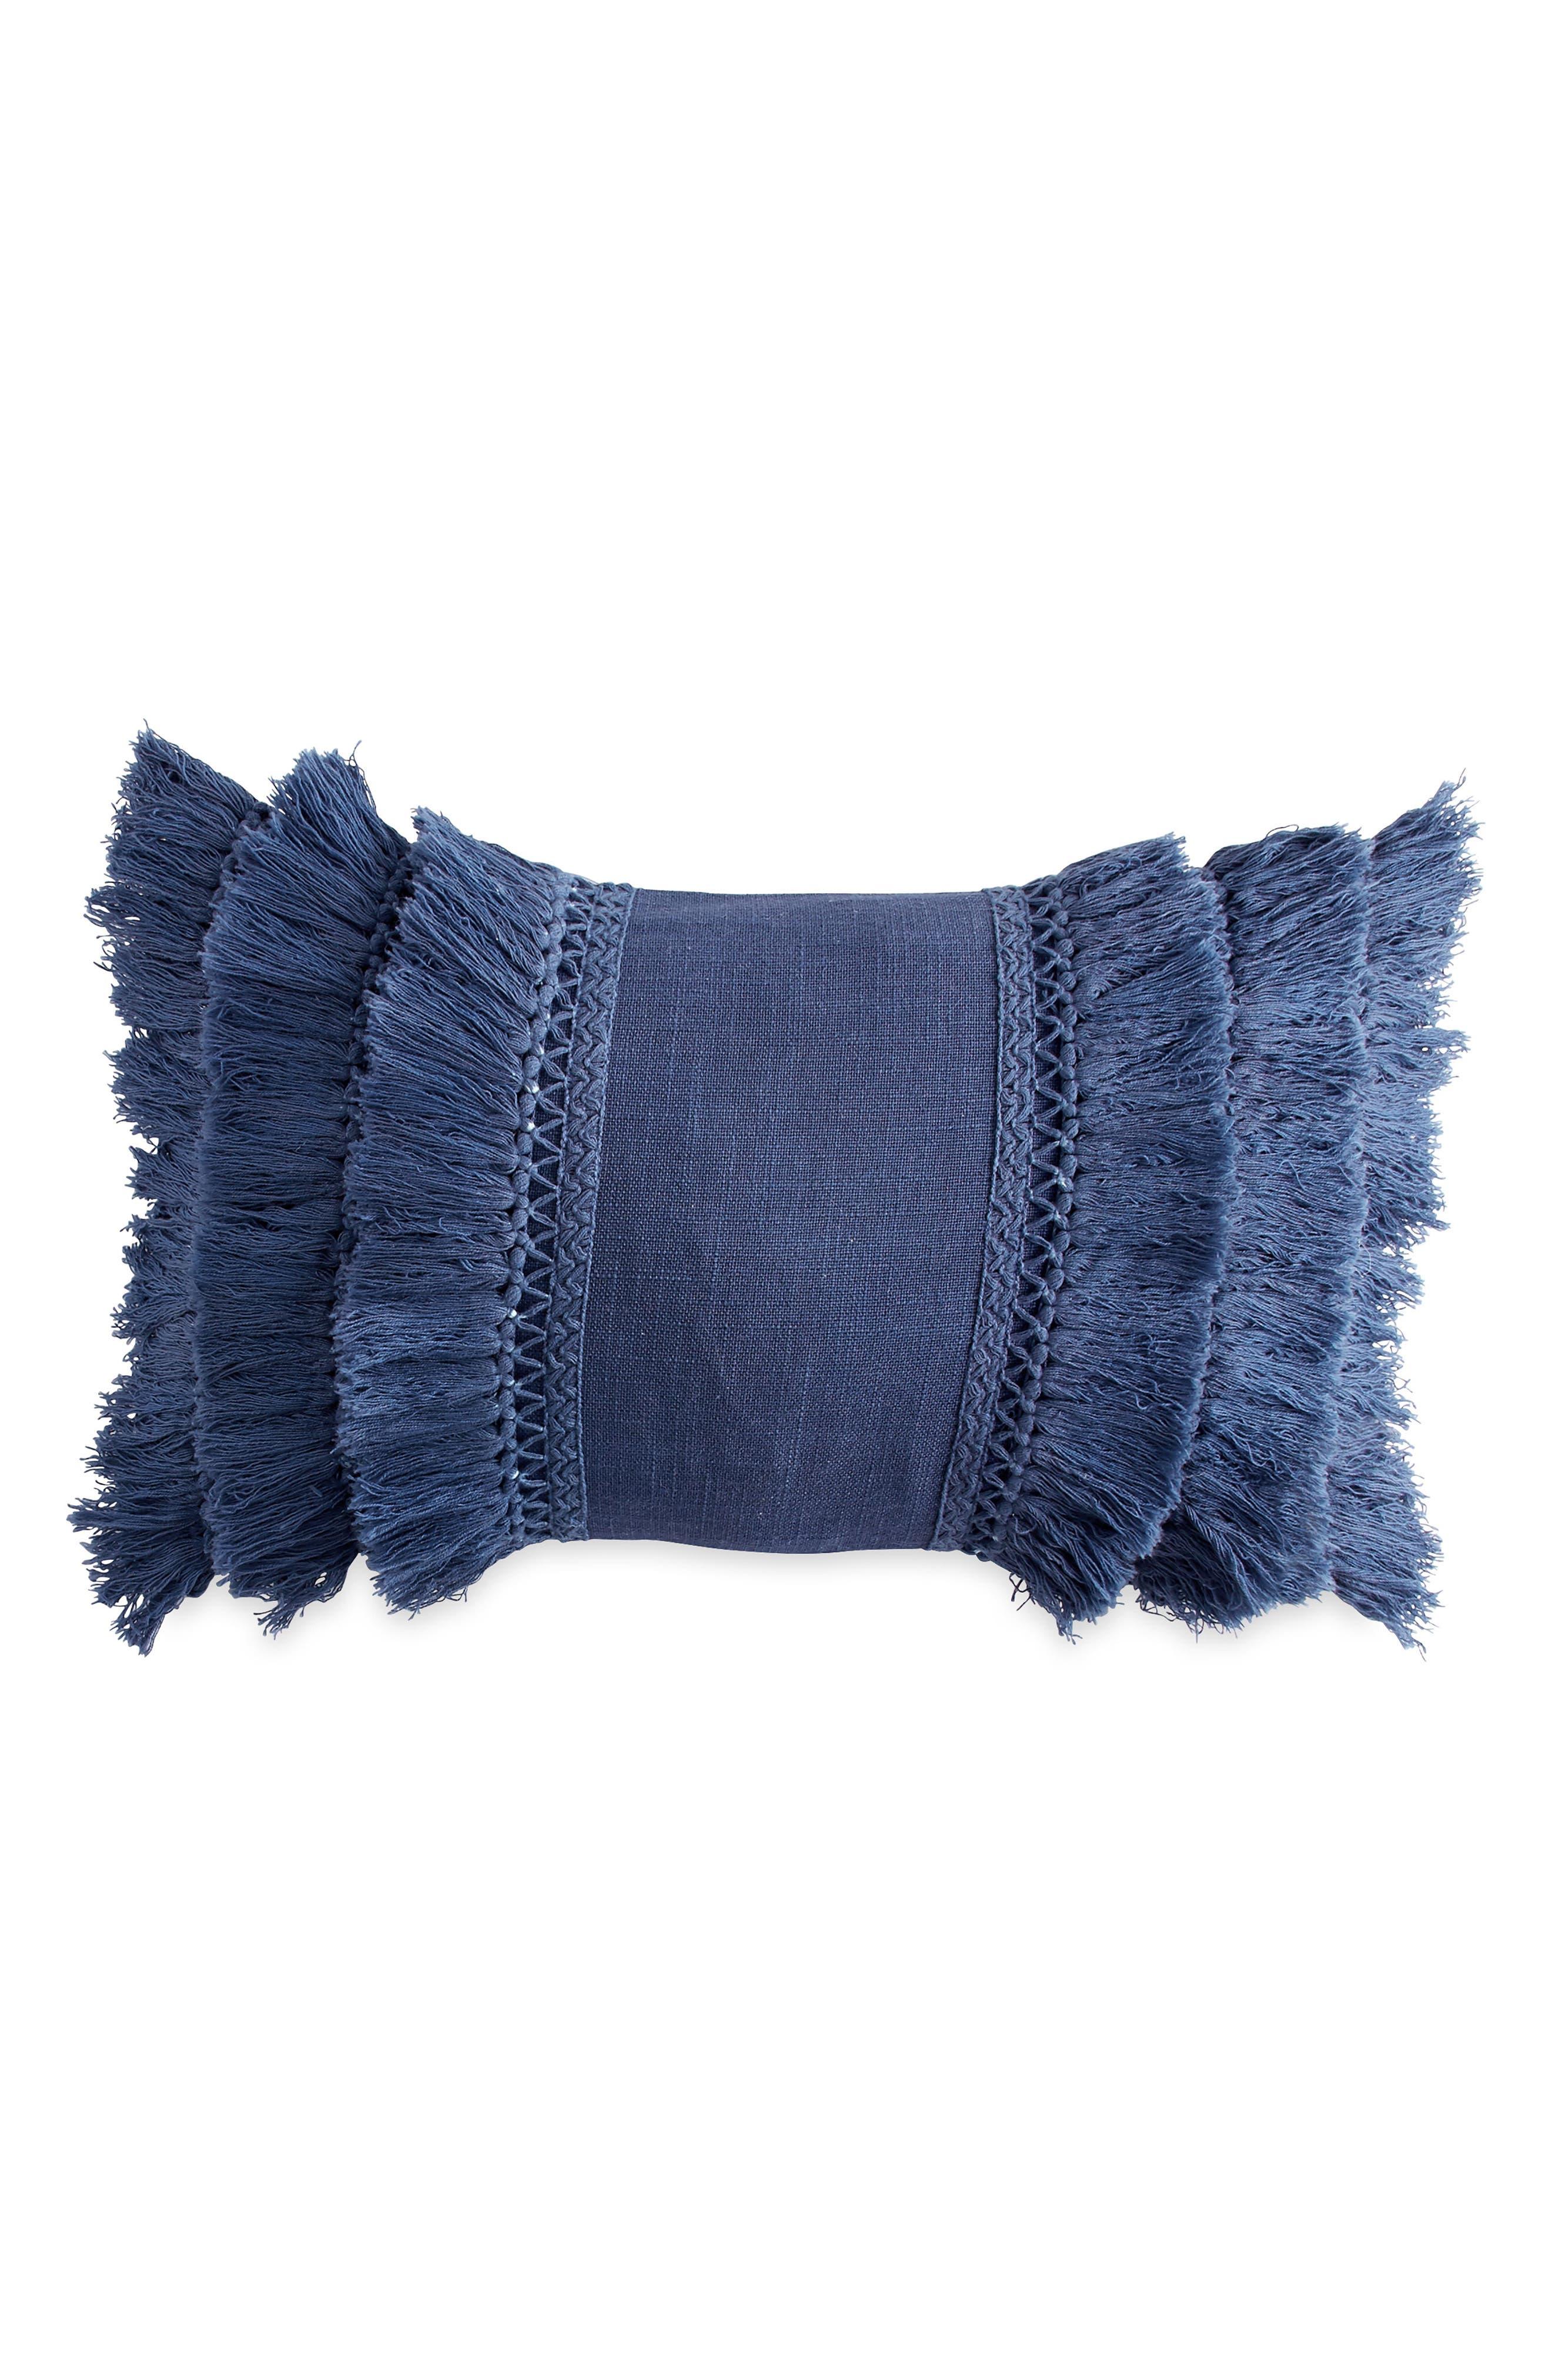 Fringe Pillow,                         Main,                         color, NAVY